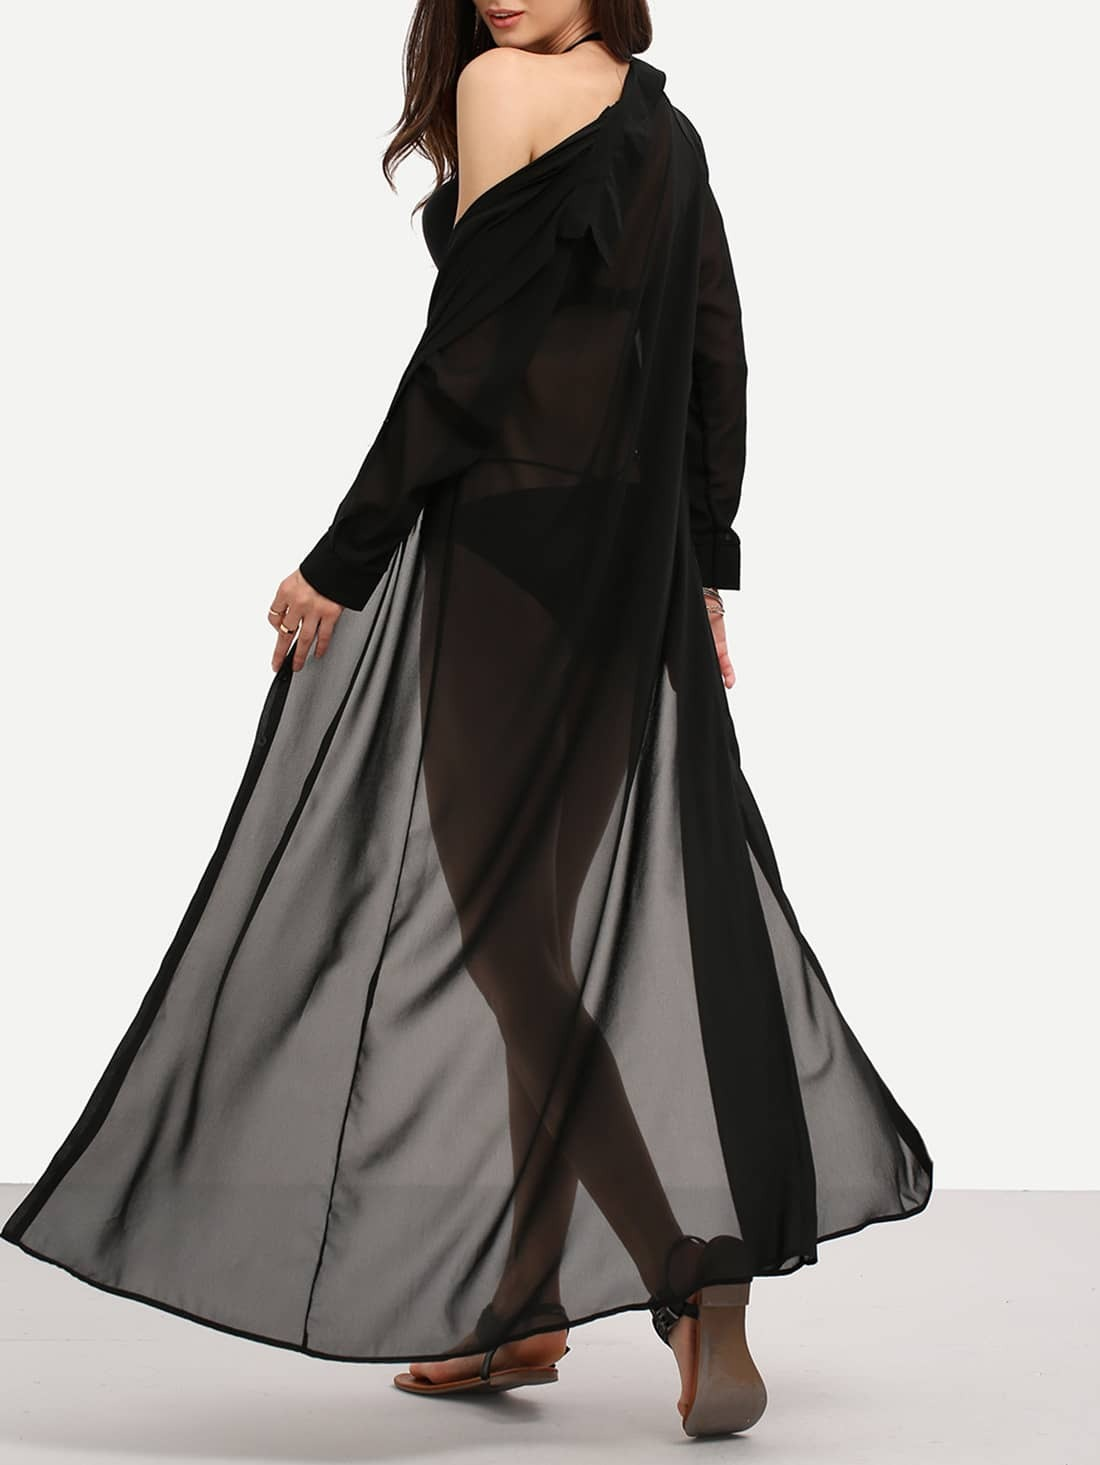 Maxi chiffon shirt dress - Dressed for less